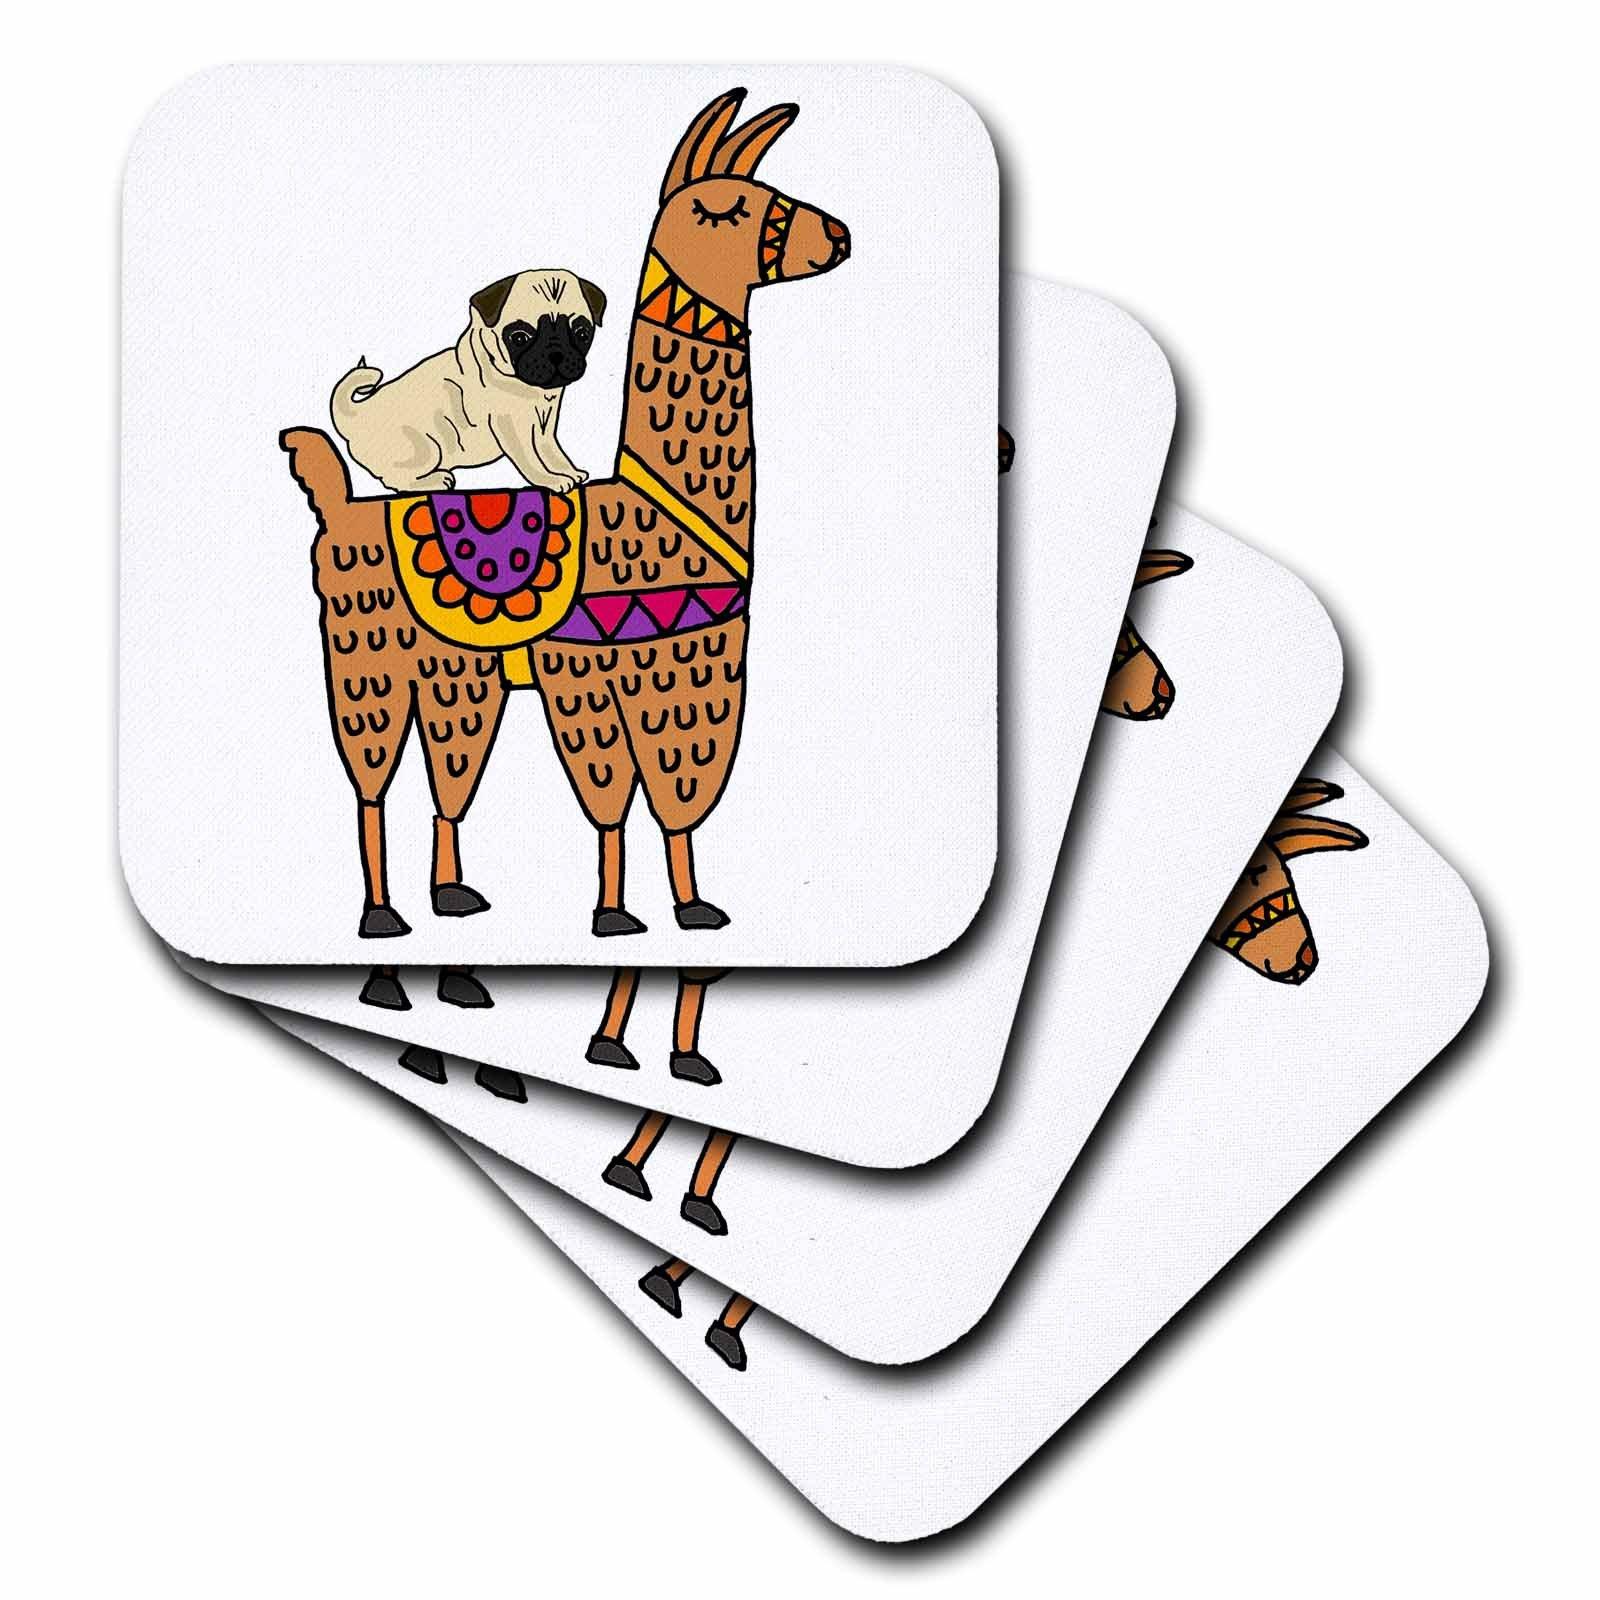 3dRose All Smiles Art Animals - Cool Humorous Pug Dog Riding llama Cartoon - set of 4 Ceramic Tile Coasters (cst_270099_3)